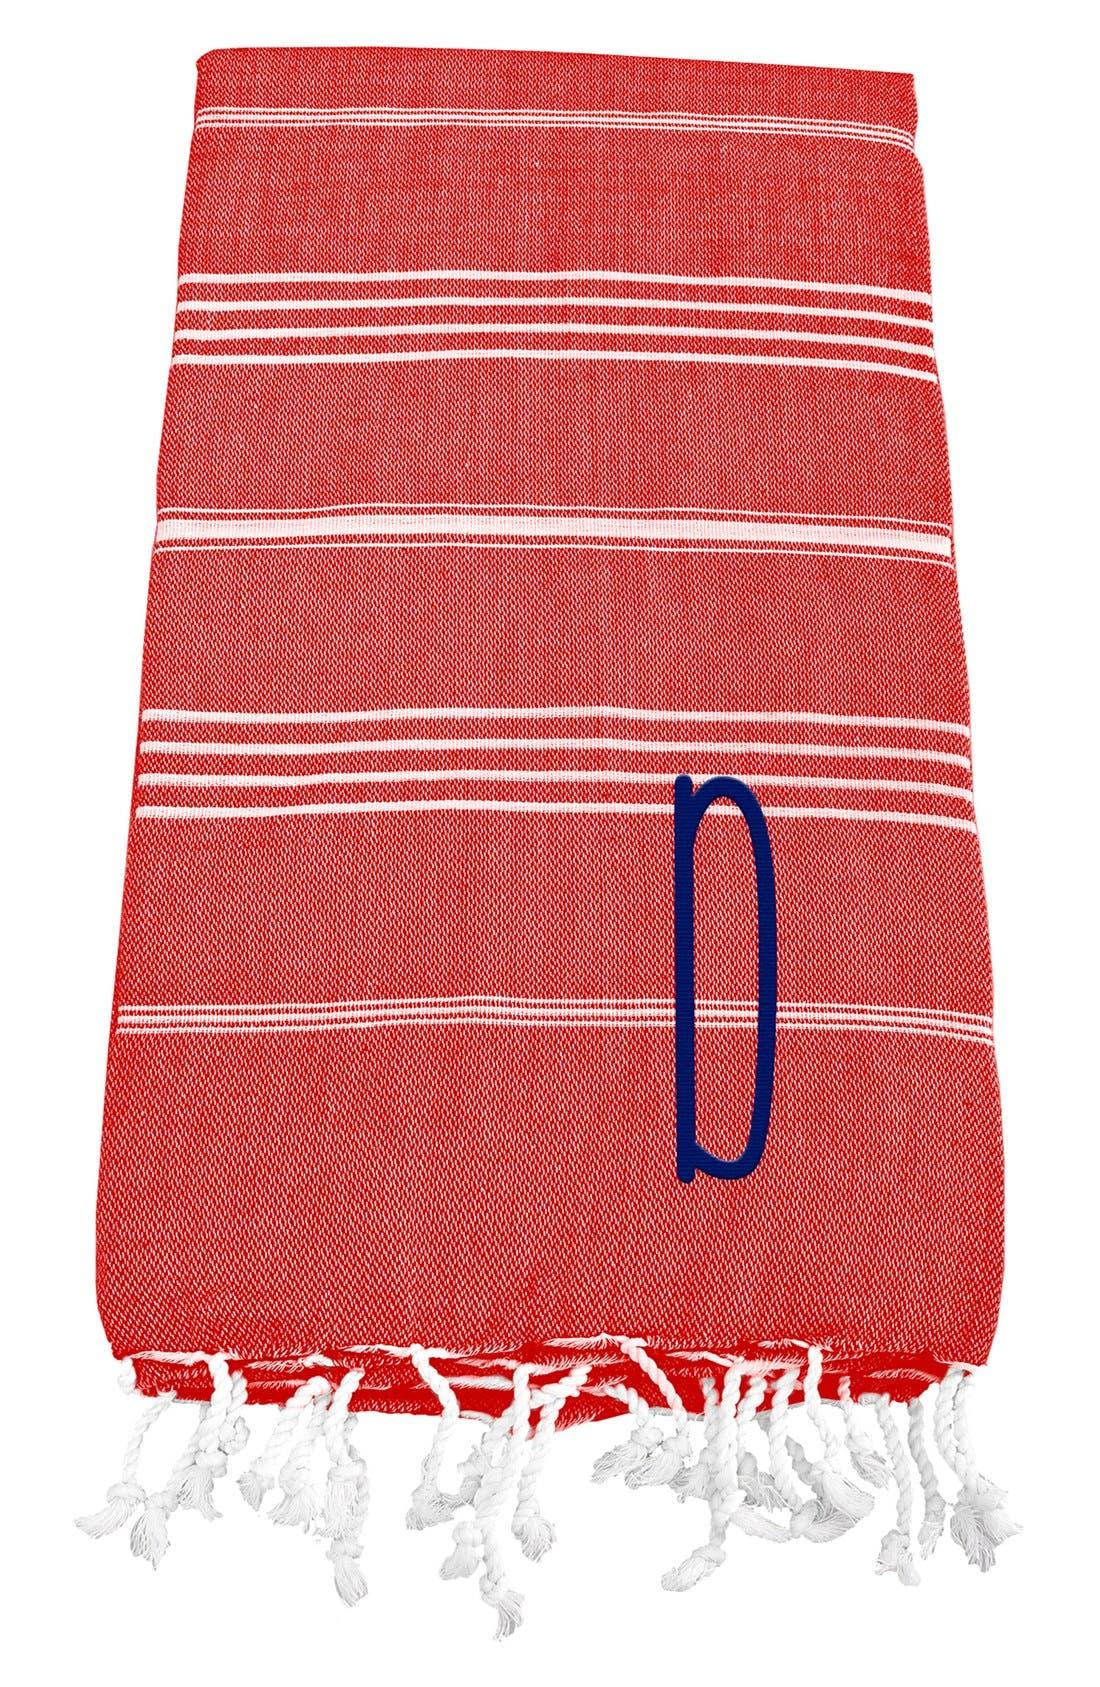 Monogram Turkish Cotton Towel,                             Main thumbnail 113, color,